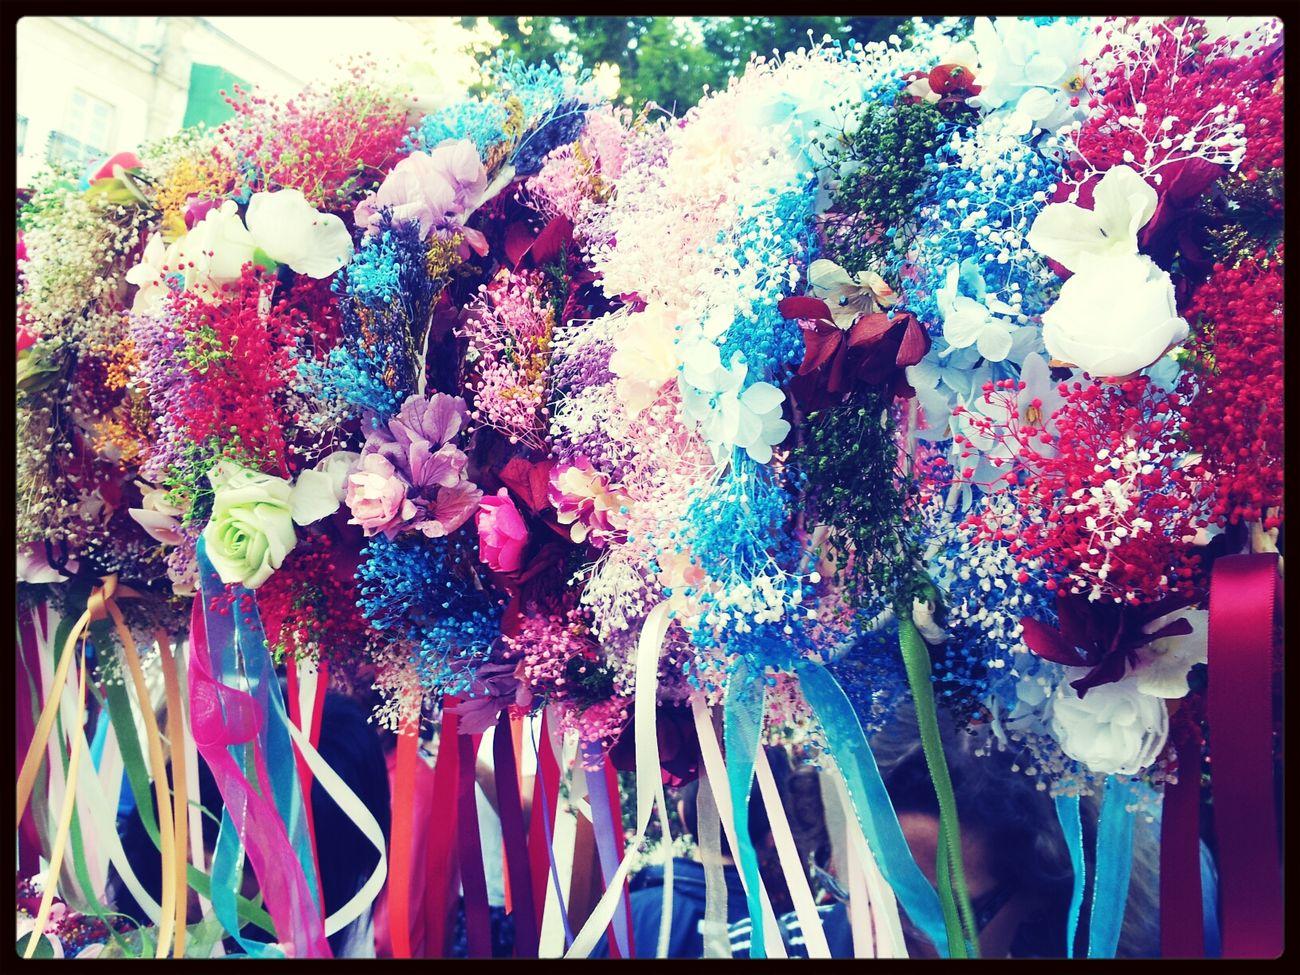 coronas de flores Arde Lucus EyeEm Meetup ARDE LUCUS Street Photography Enjoying Life